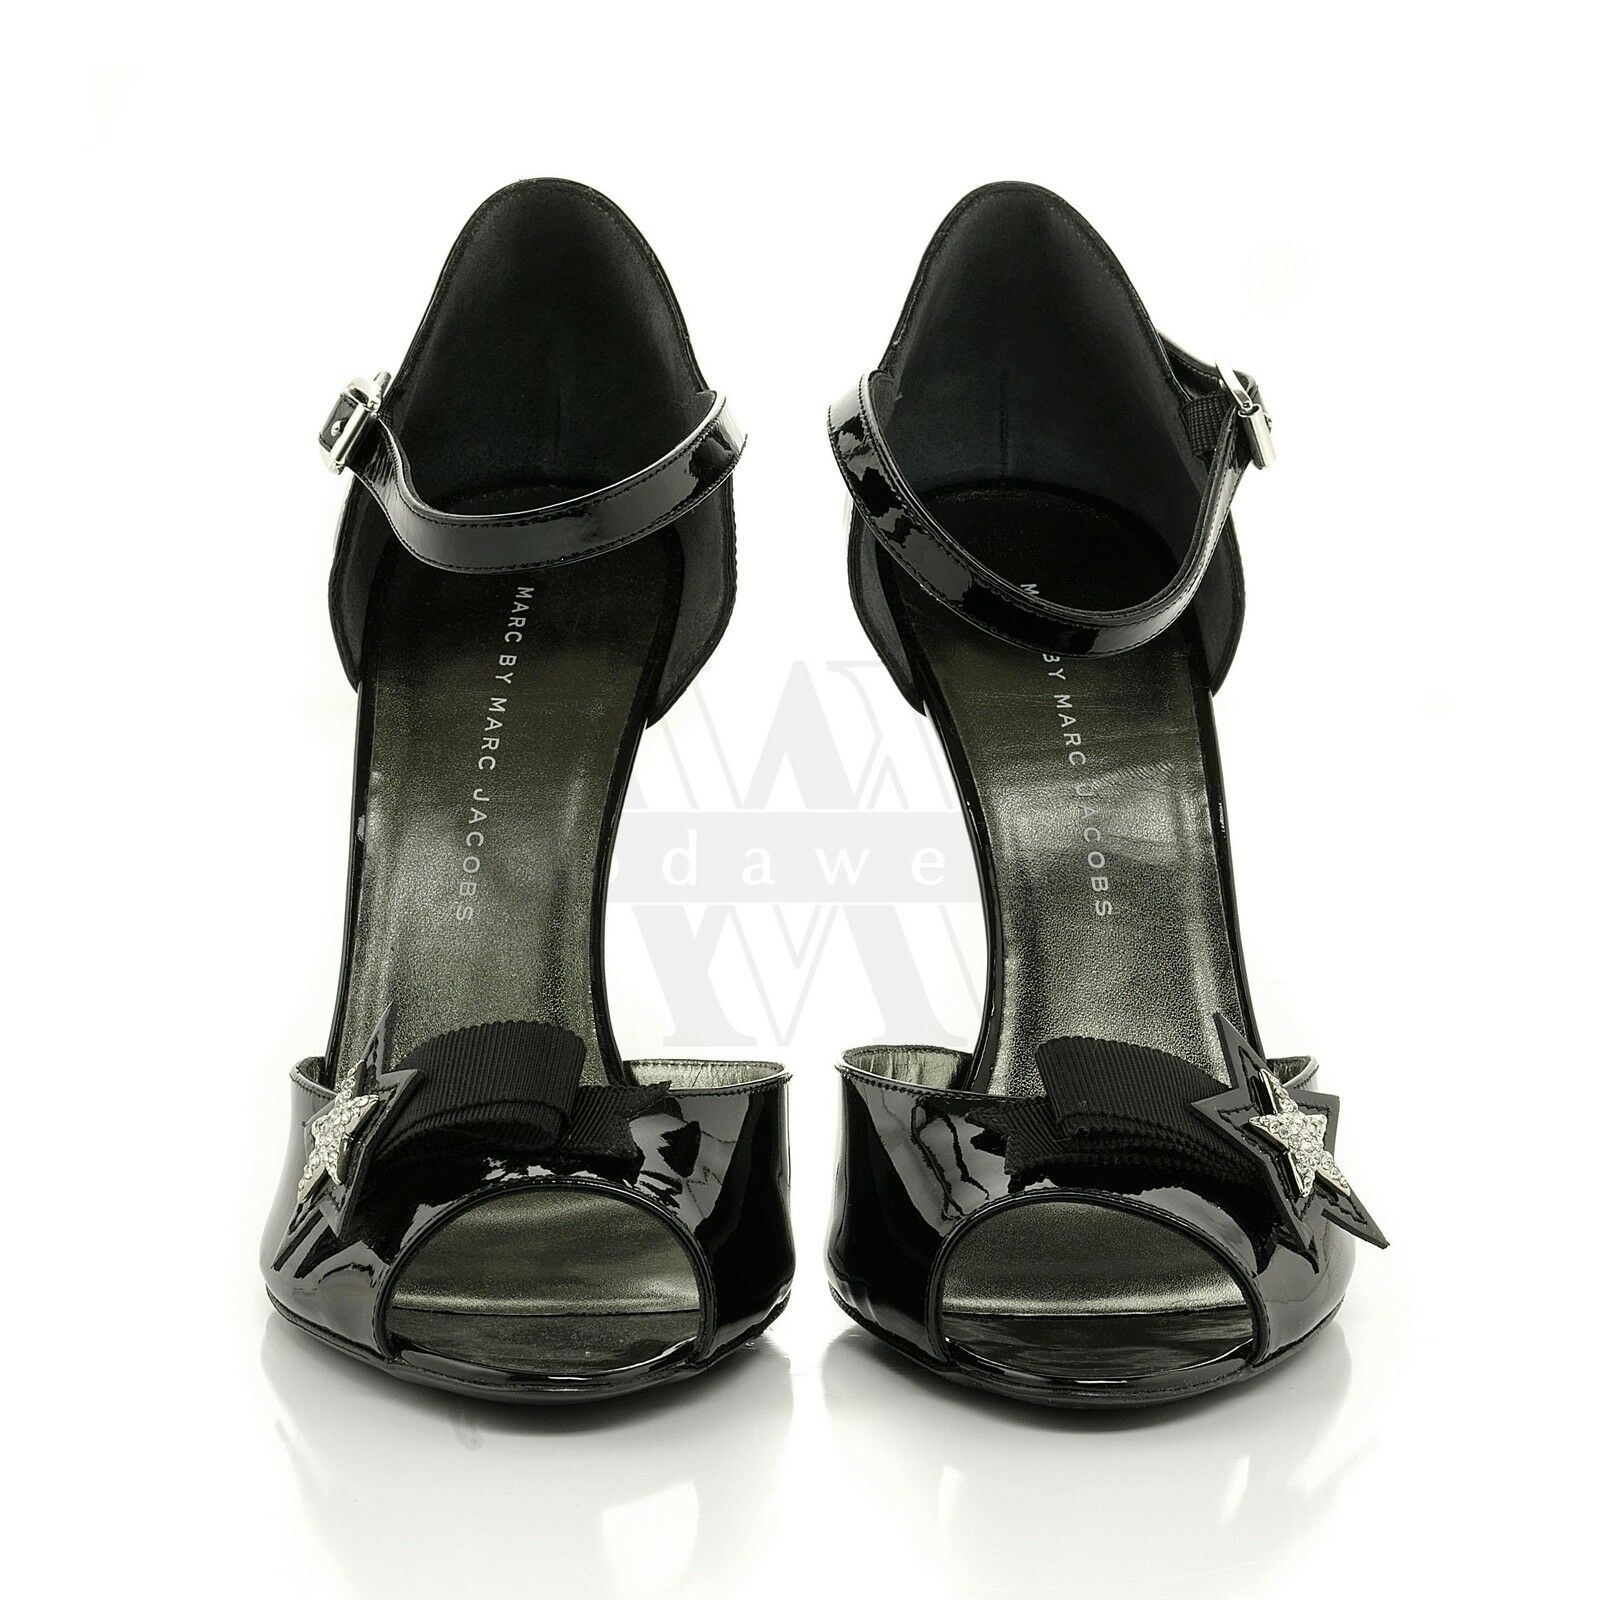 Marc Jacobs 693960 Black w/ Rhinestones Patent Leather Sandal 10 40 NIB $630